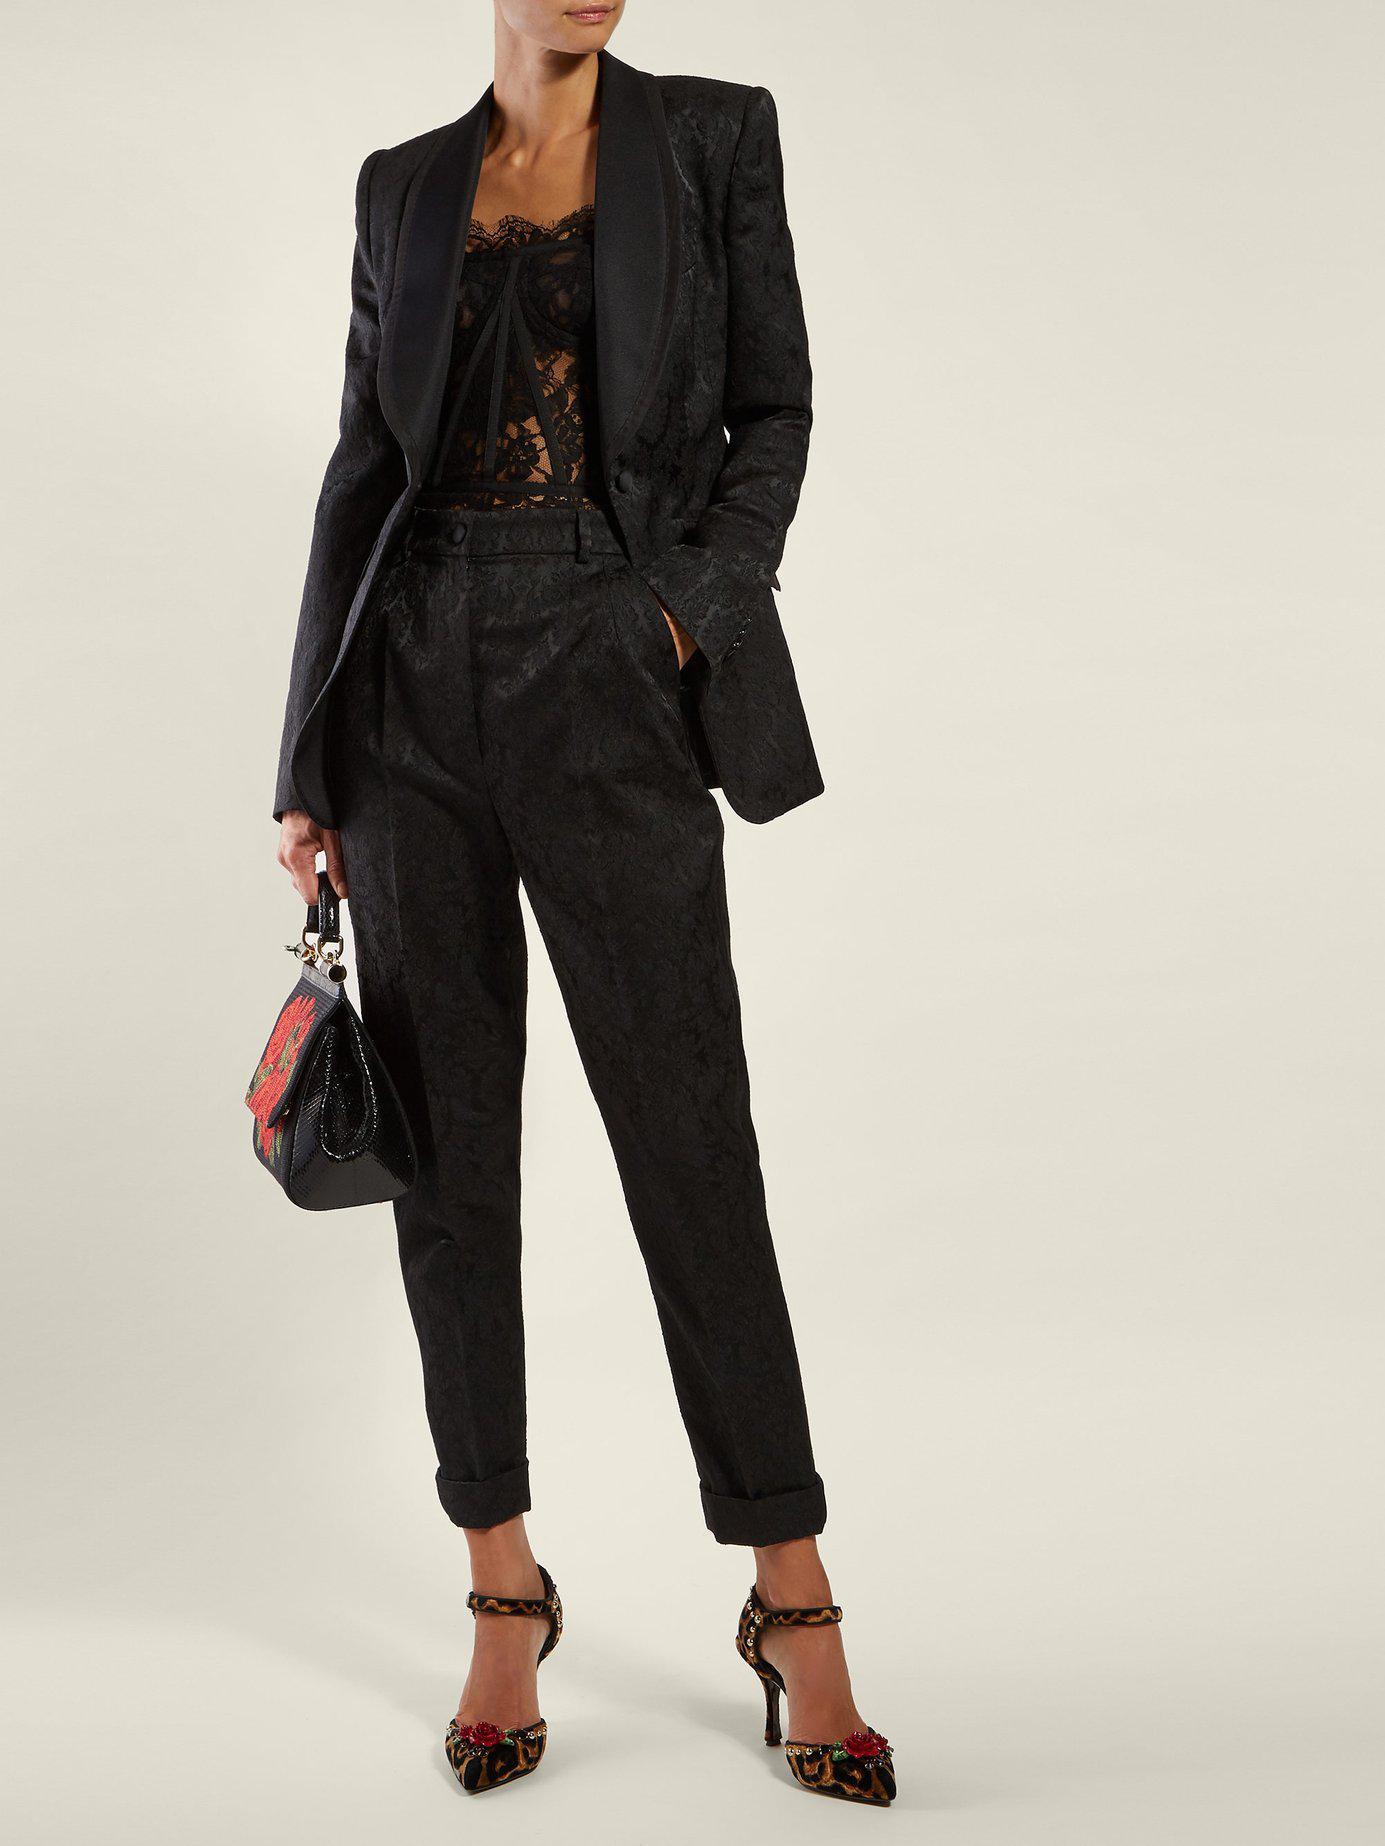 04aa8edbf Dolce   Gabbana Scallop Edged Lace Bustier Top in Black - Lyst